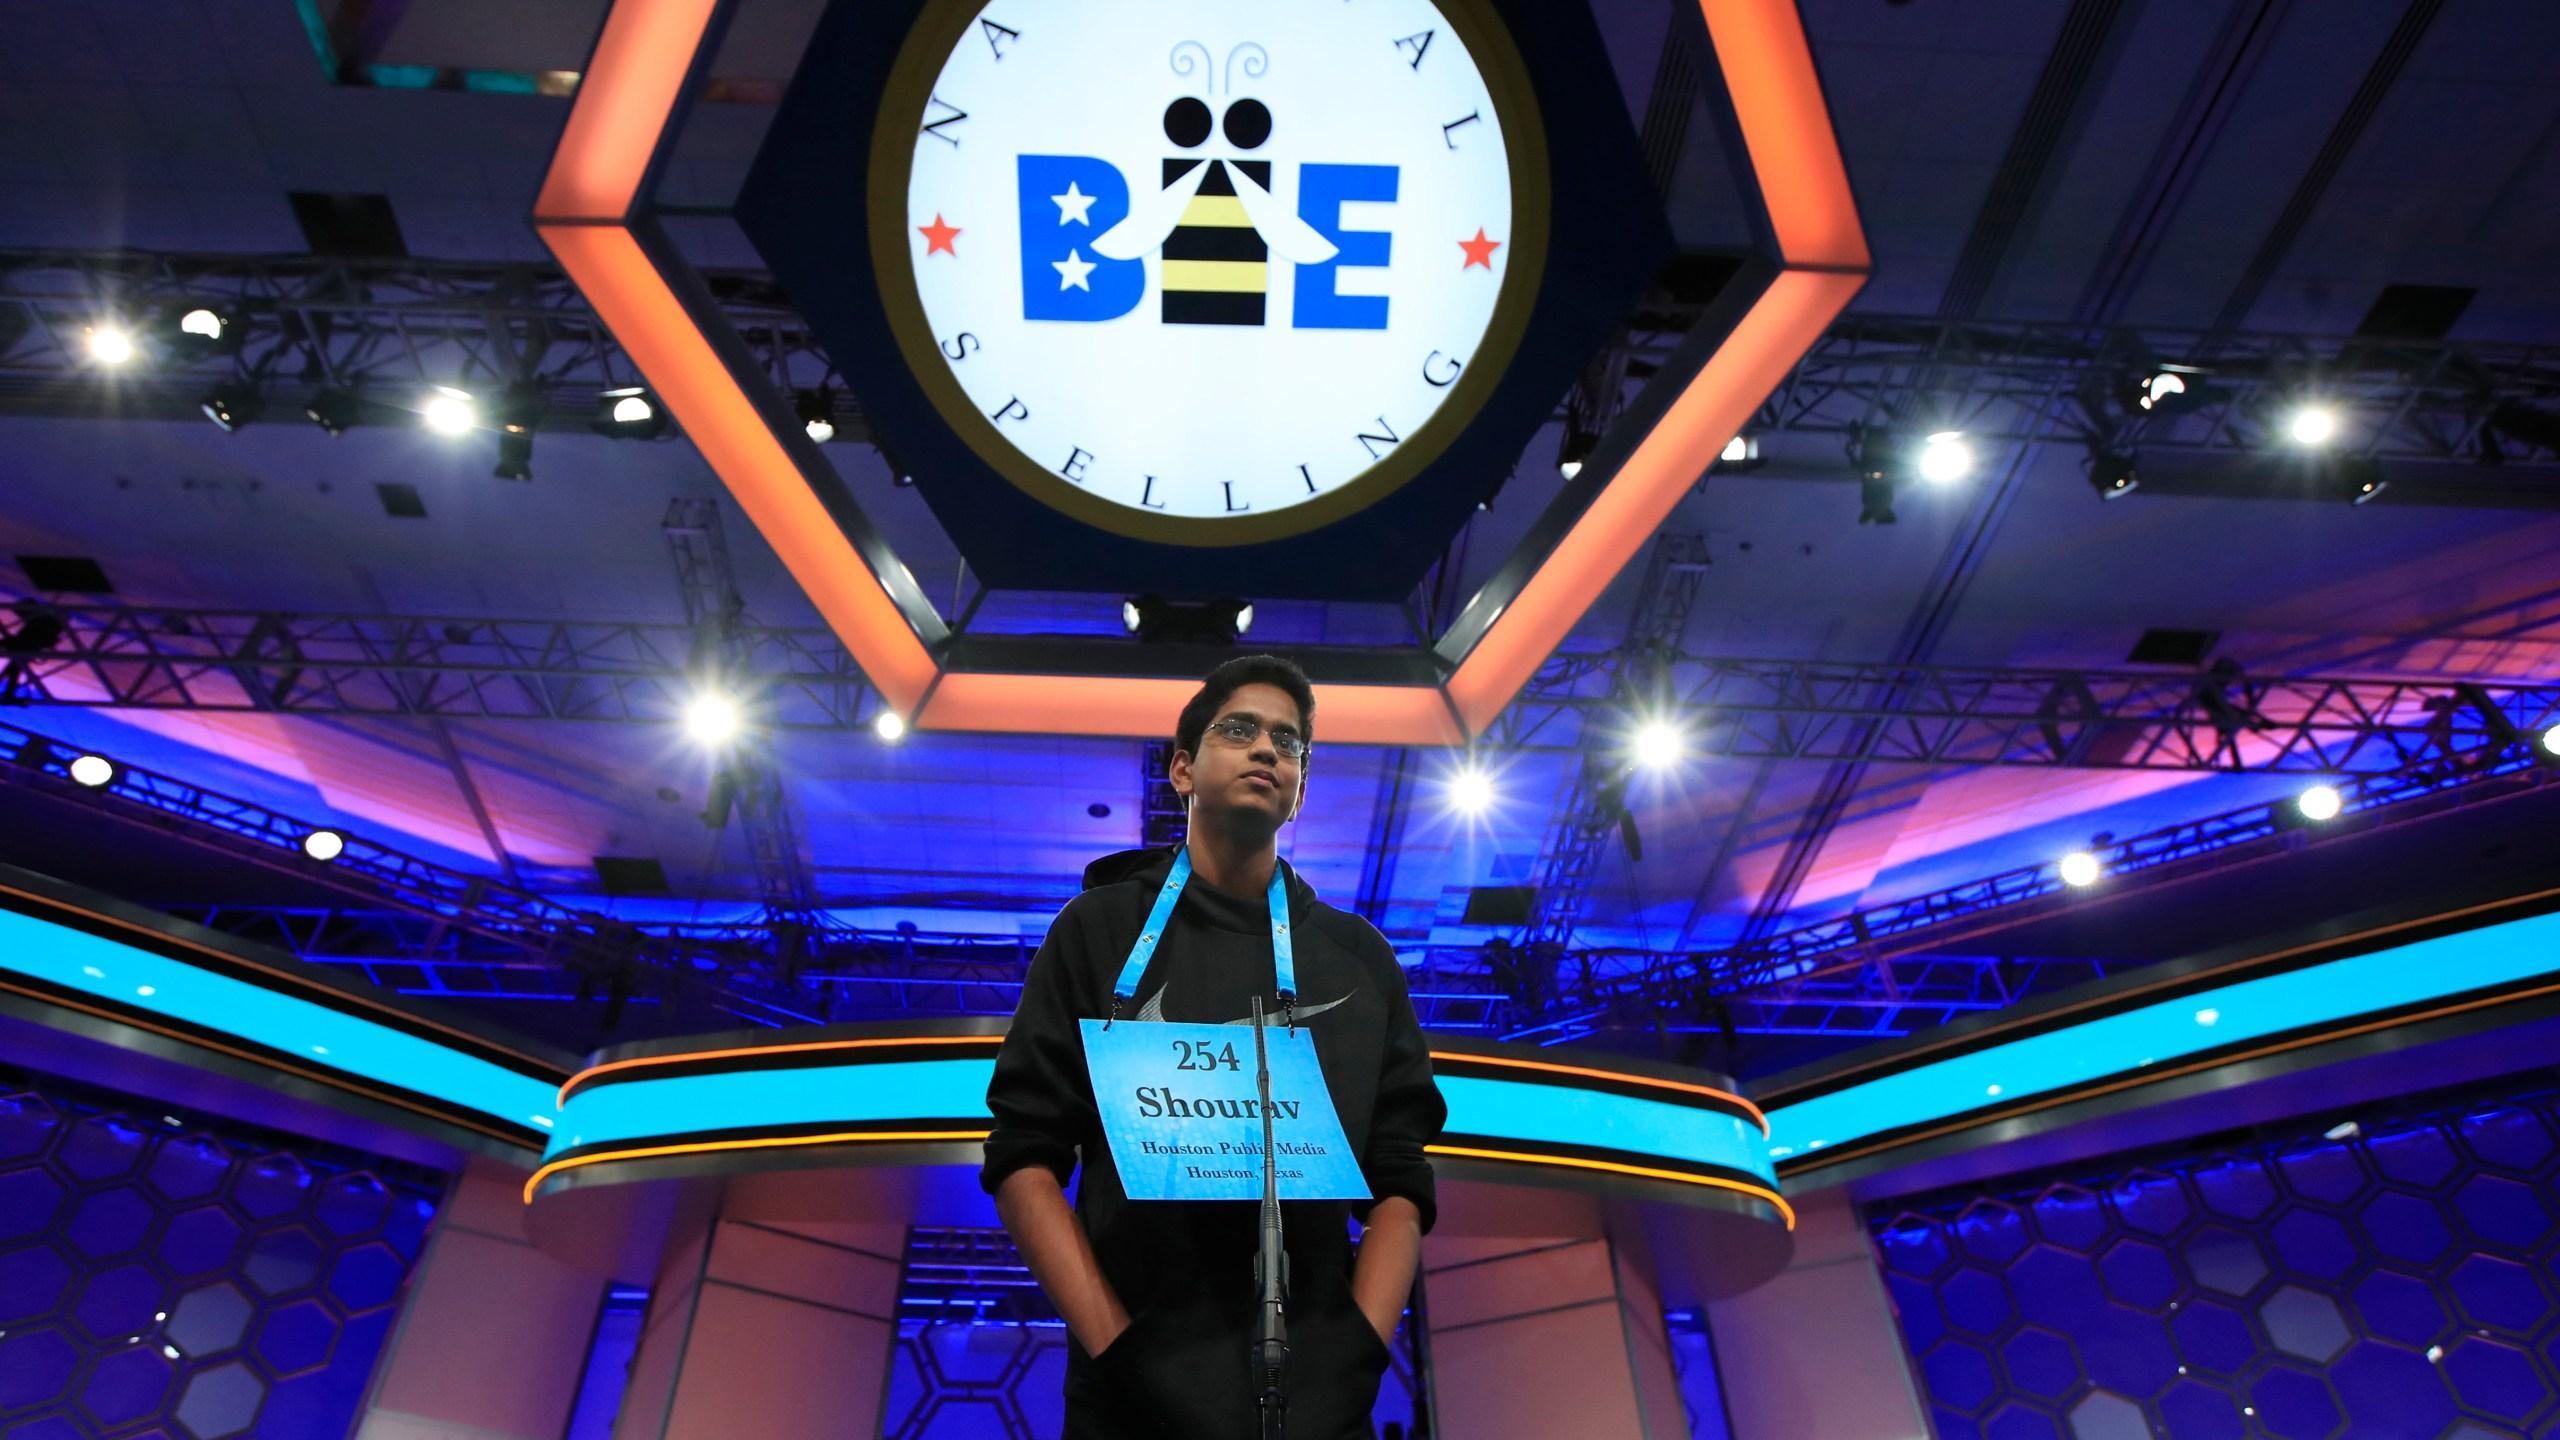 Shourav Dasari